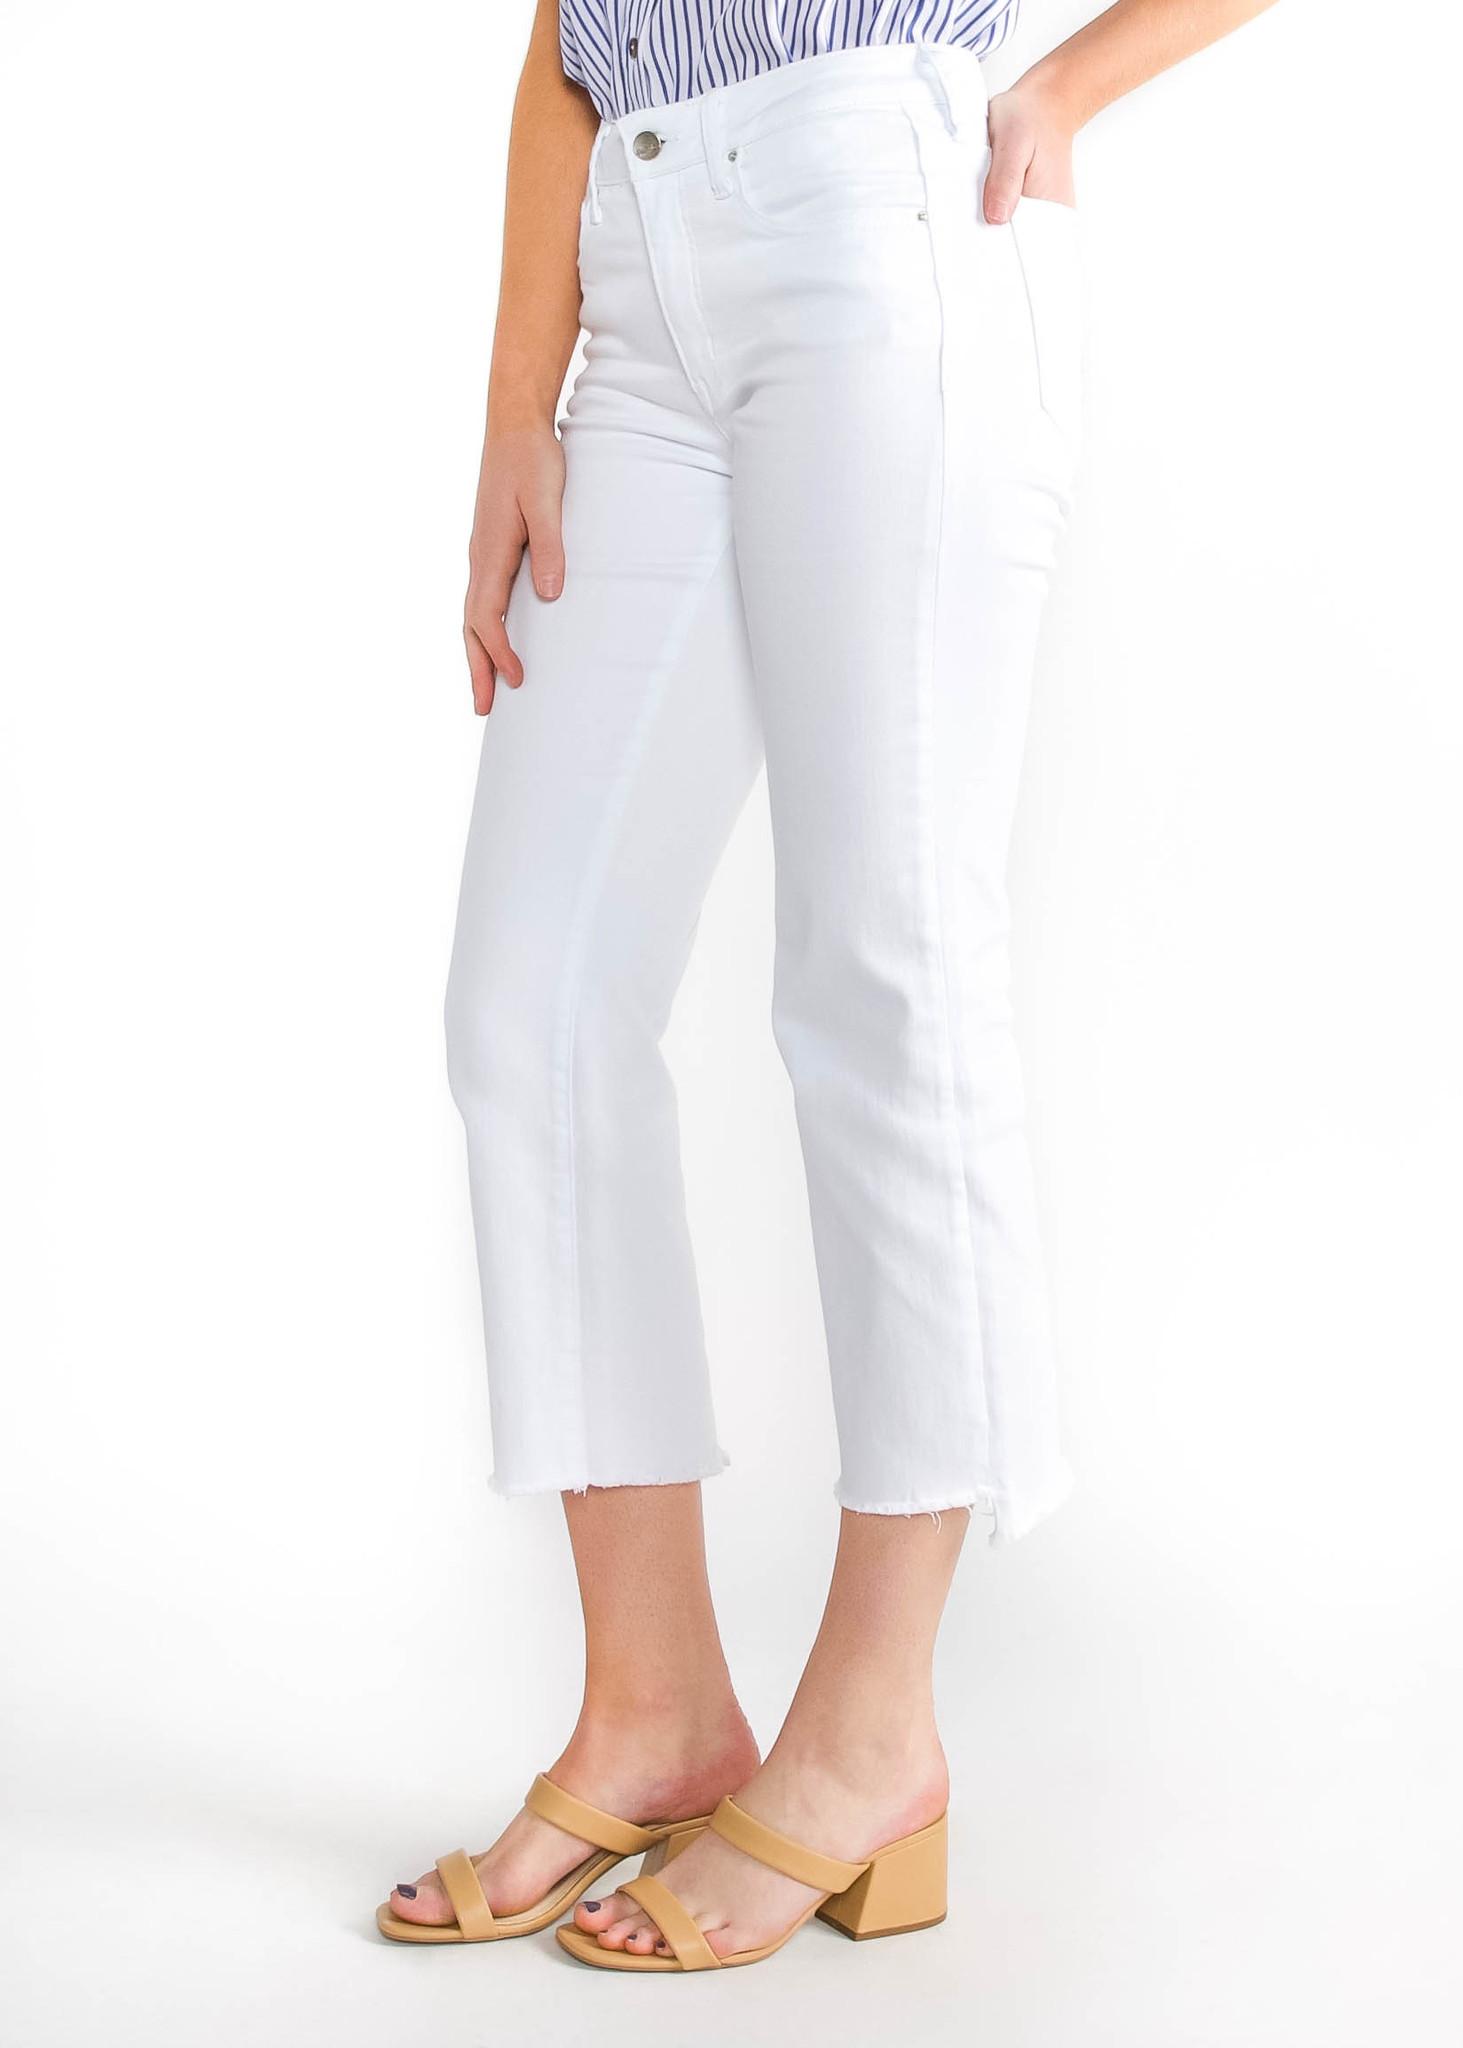 MODERN BEAUTY WHITE JEANS